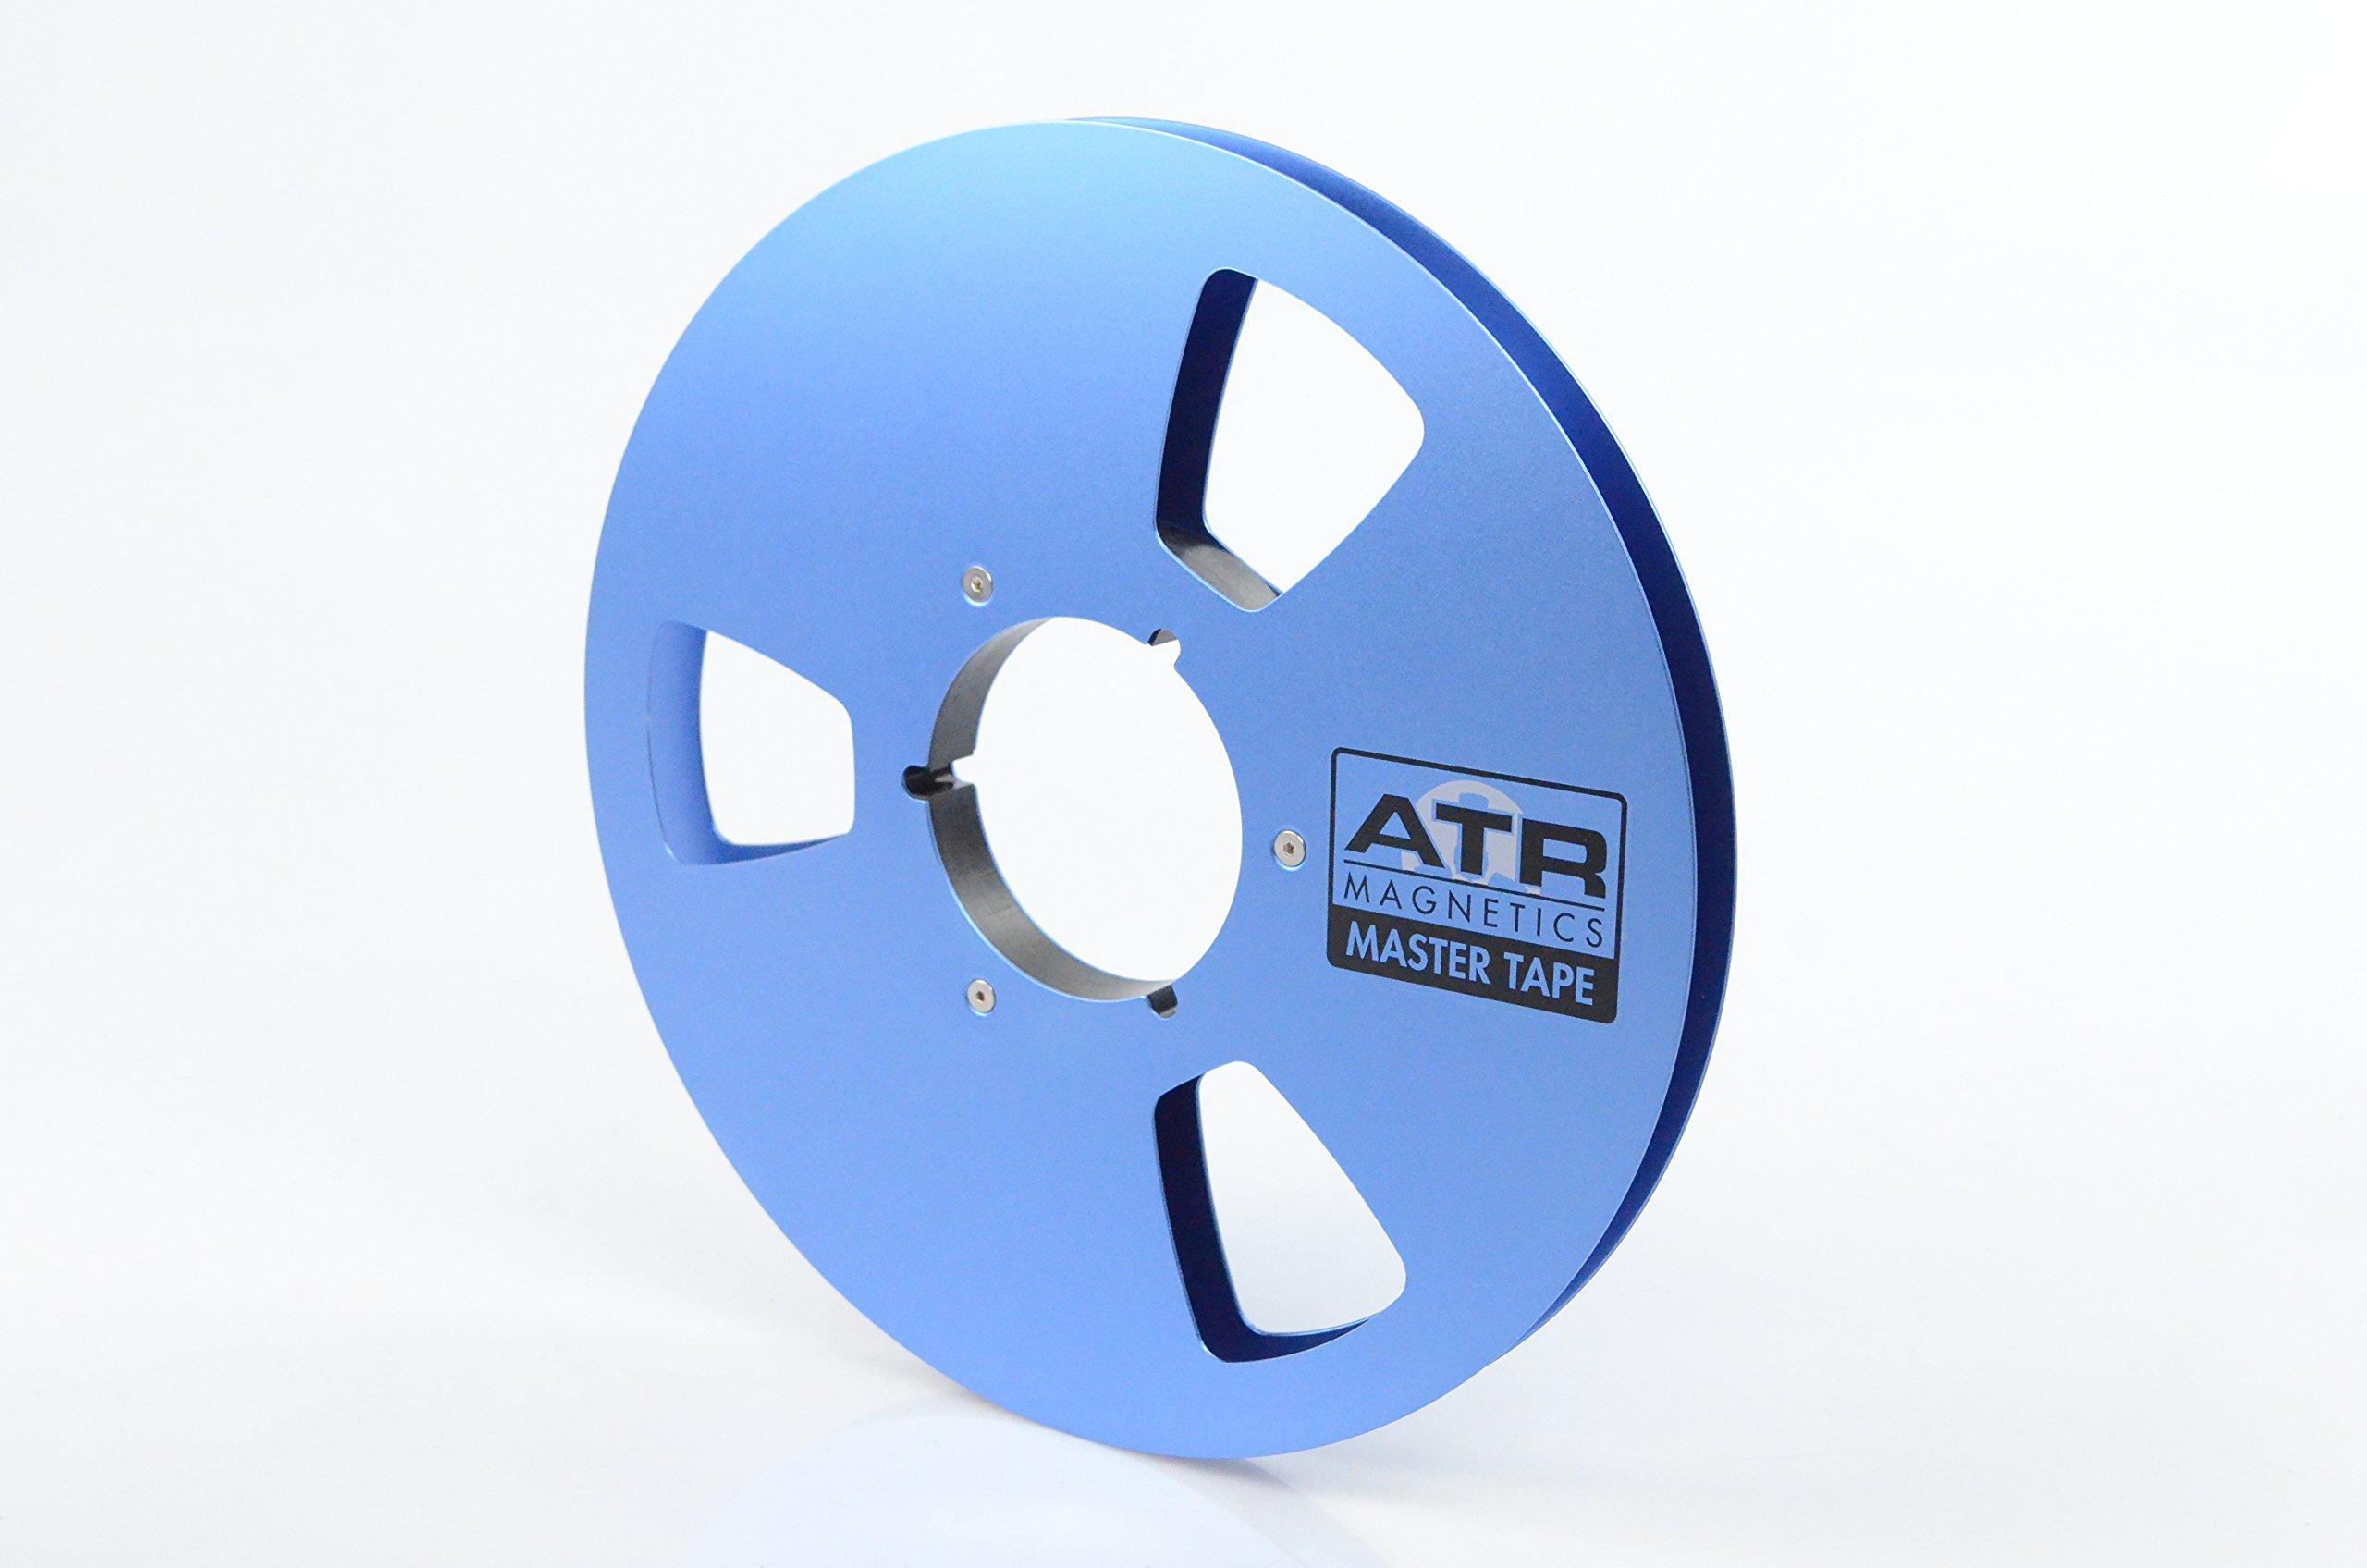 ATR Magnetics 1/2'' Master Tape   10.5'' Reel   Empty